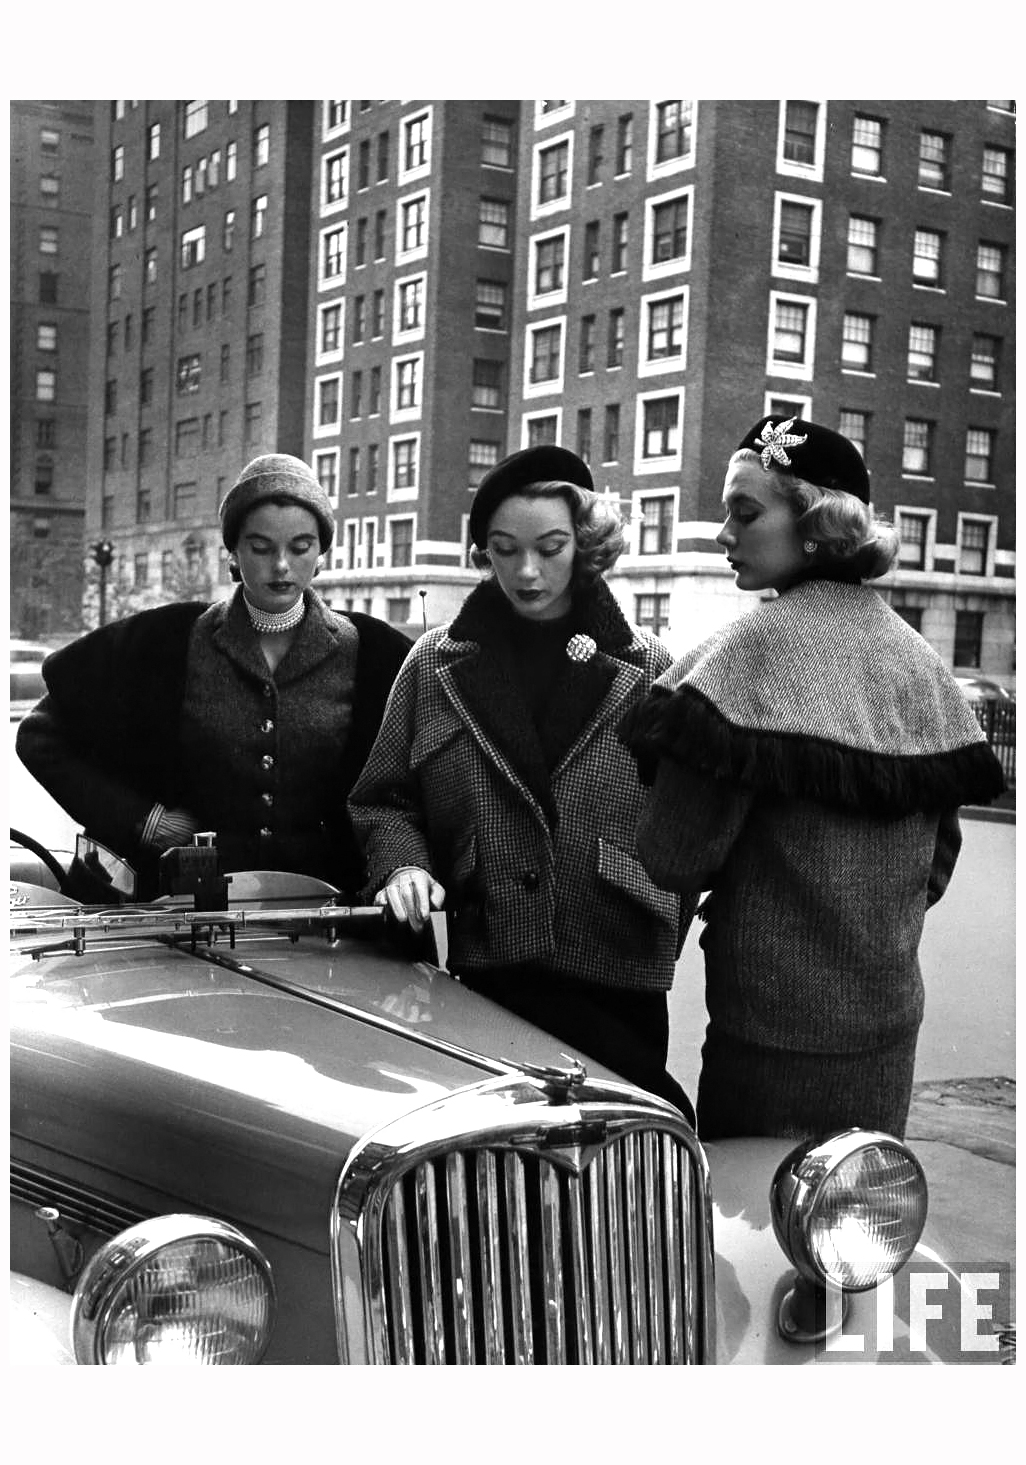 Photo Nina Leen 1951 | © Pleasurephoto Room